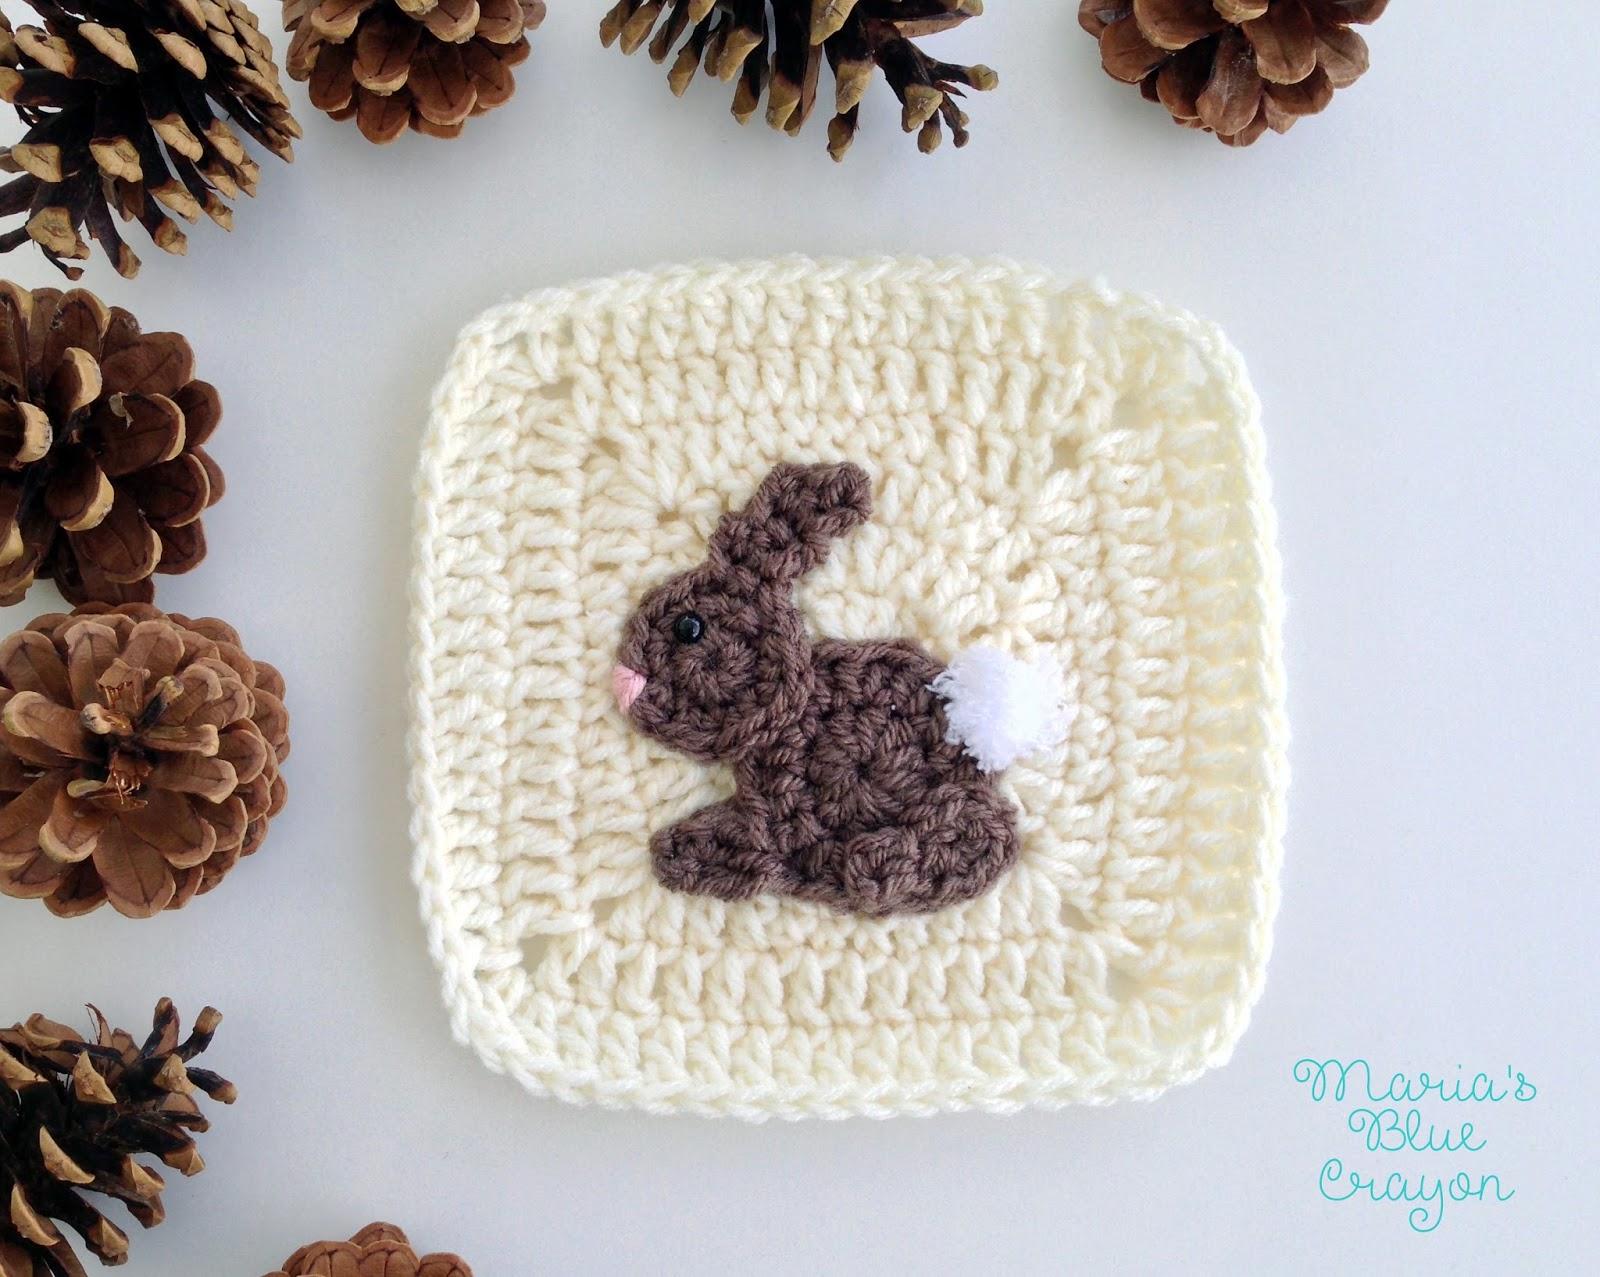 Woodland Bunny Granny Square Woodland Afghan Series Free Crochet